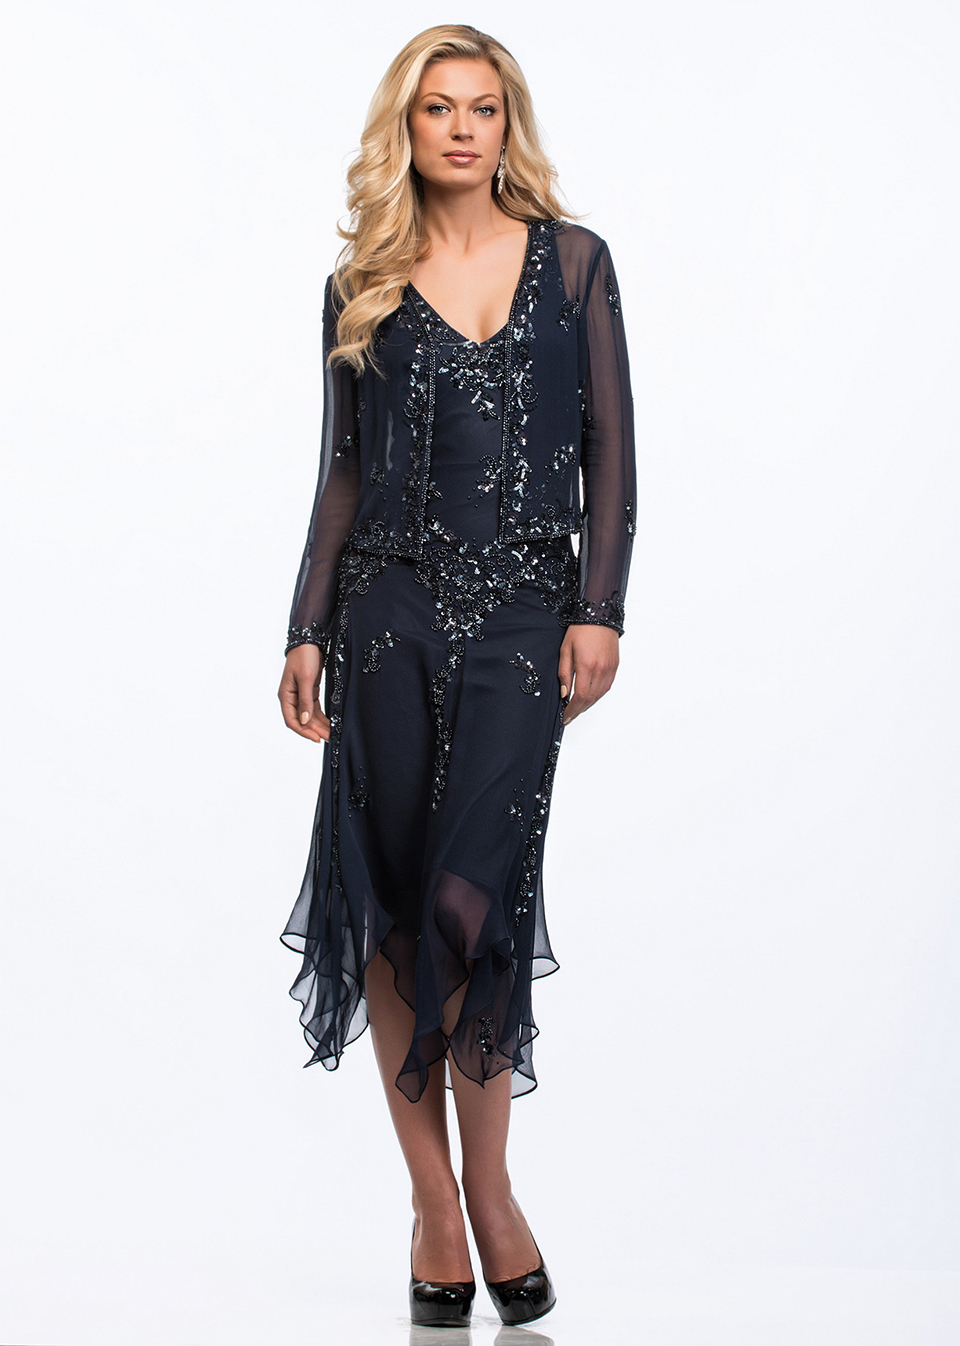 Cocktail Dresses With Handkerchief Hemline 13